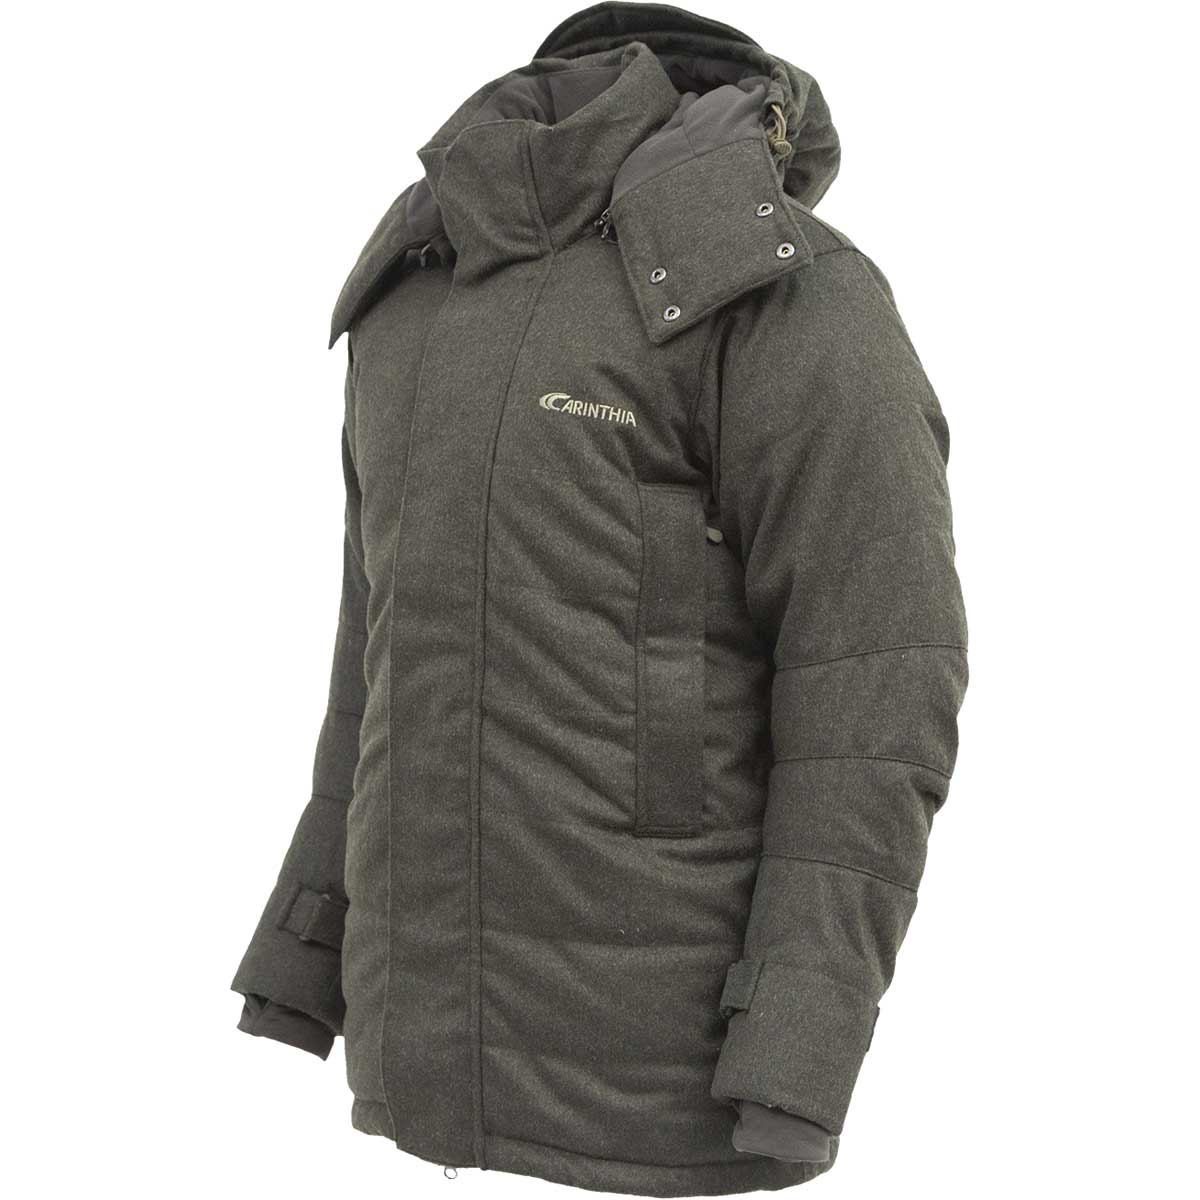 cheap for discount 59f95 27010 CARINTHIA Daunen Loden-Parka oliv